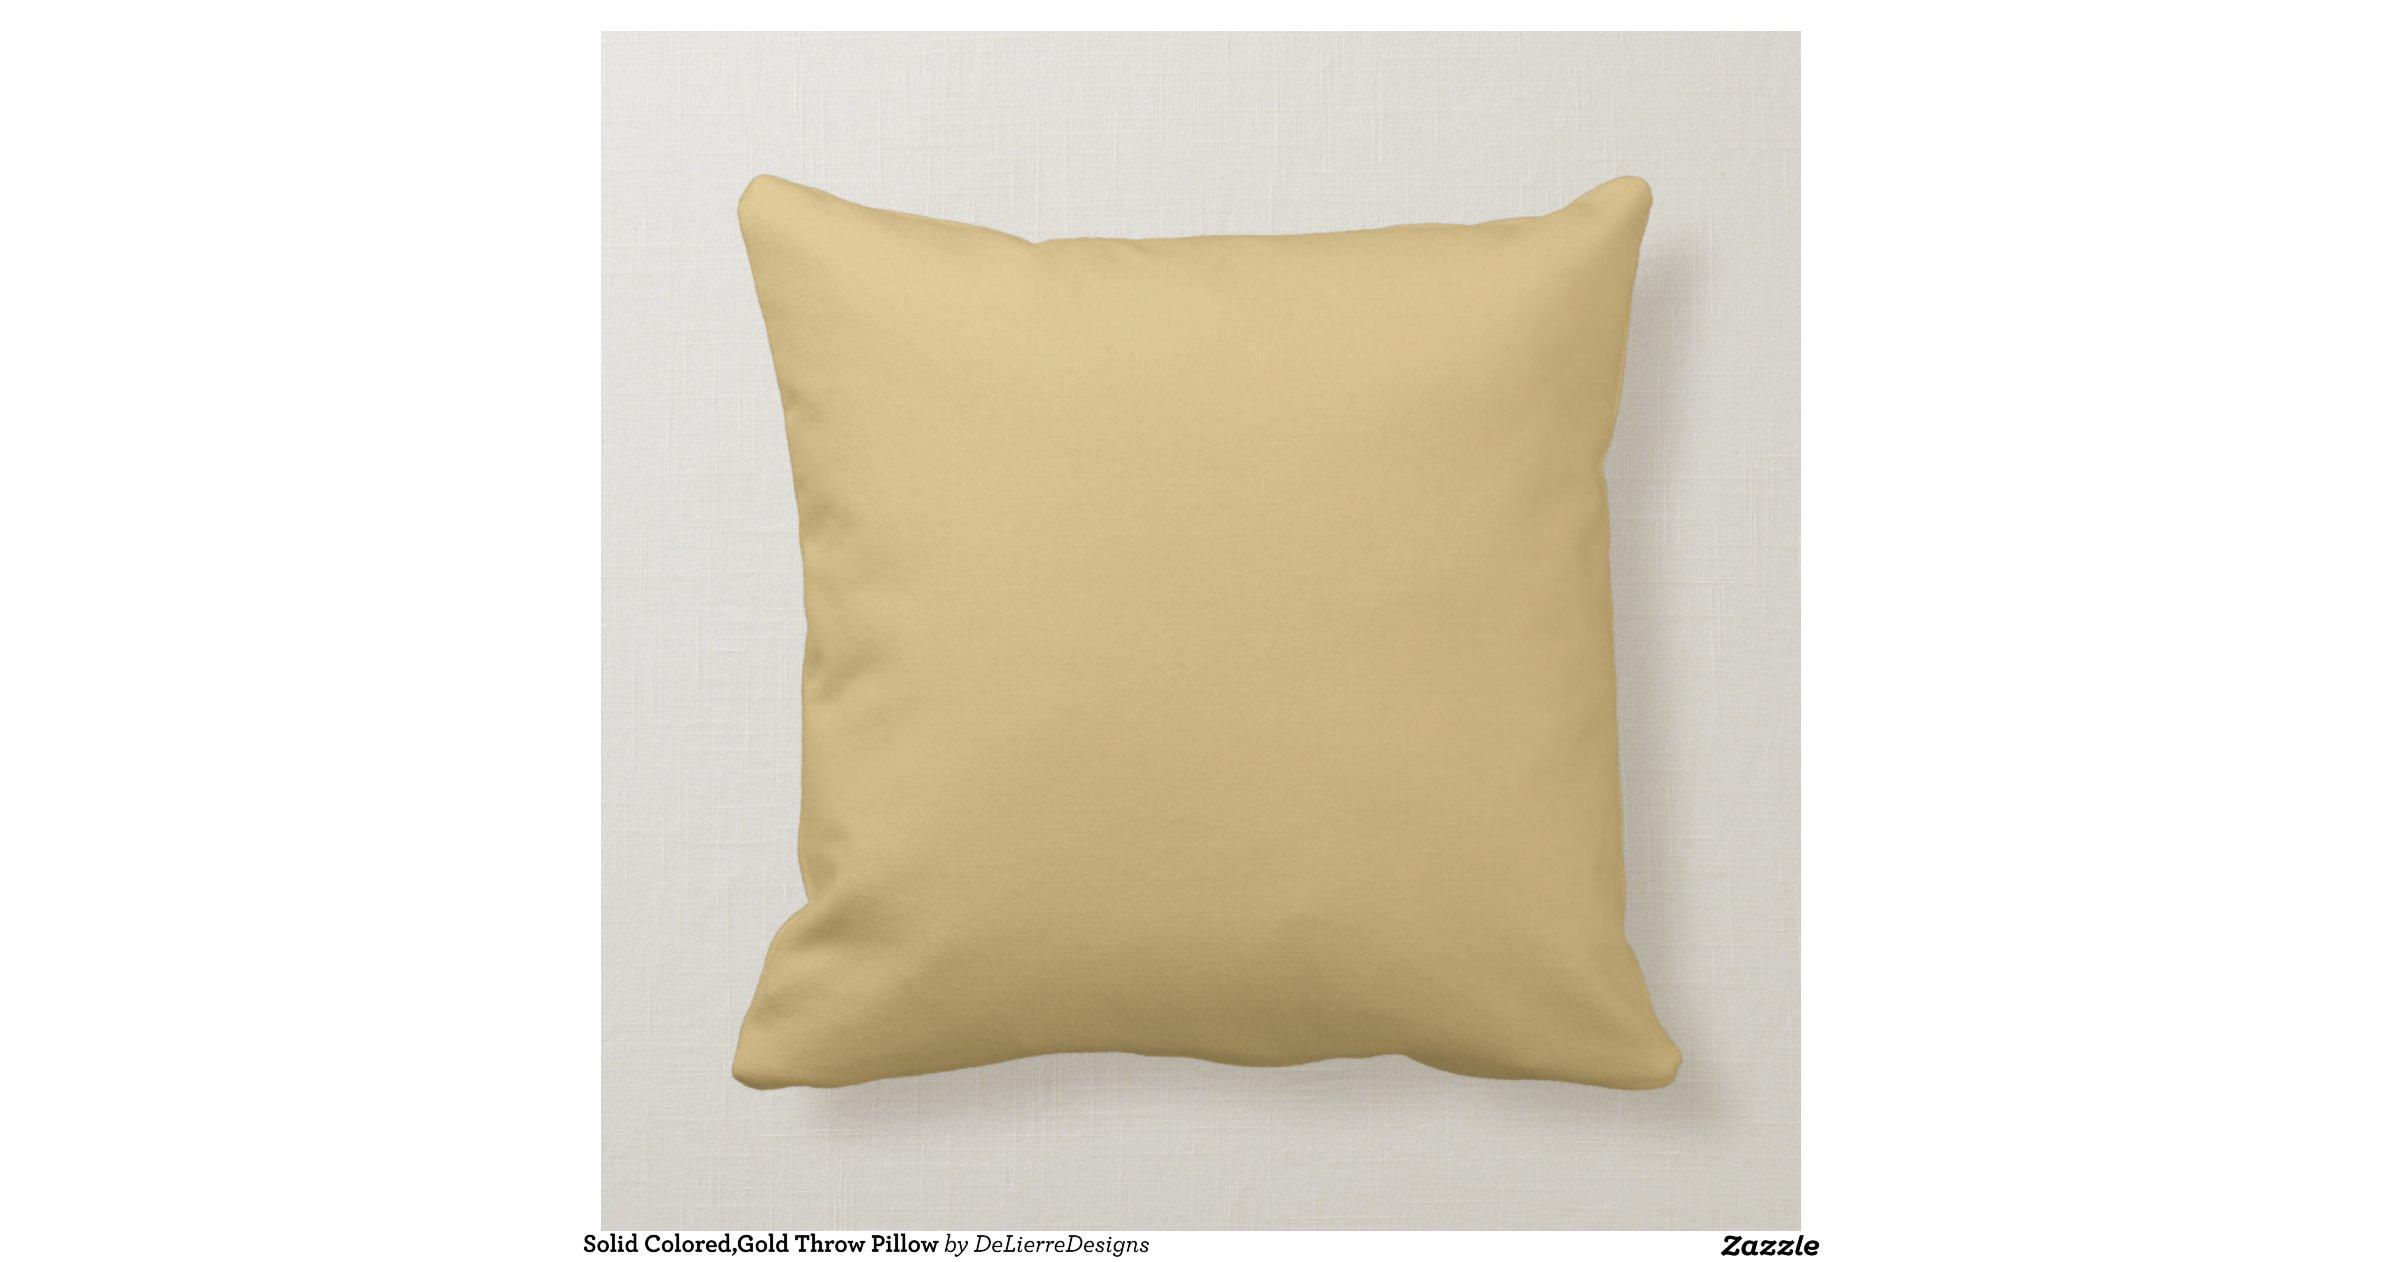 solid_colored_gold_throw_pillow-rfea08a4b4f124704b21b3b41bdc4ddab_i5fqz_8byvr_1200.jpg?view ...